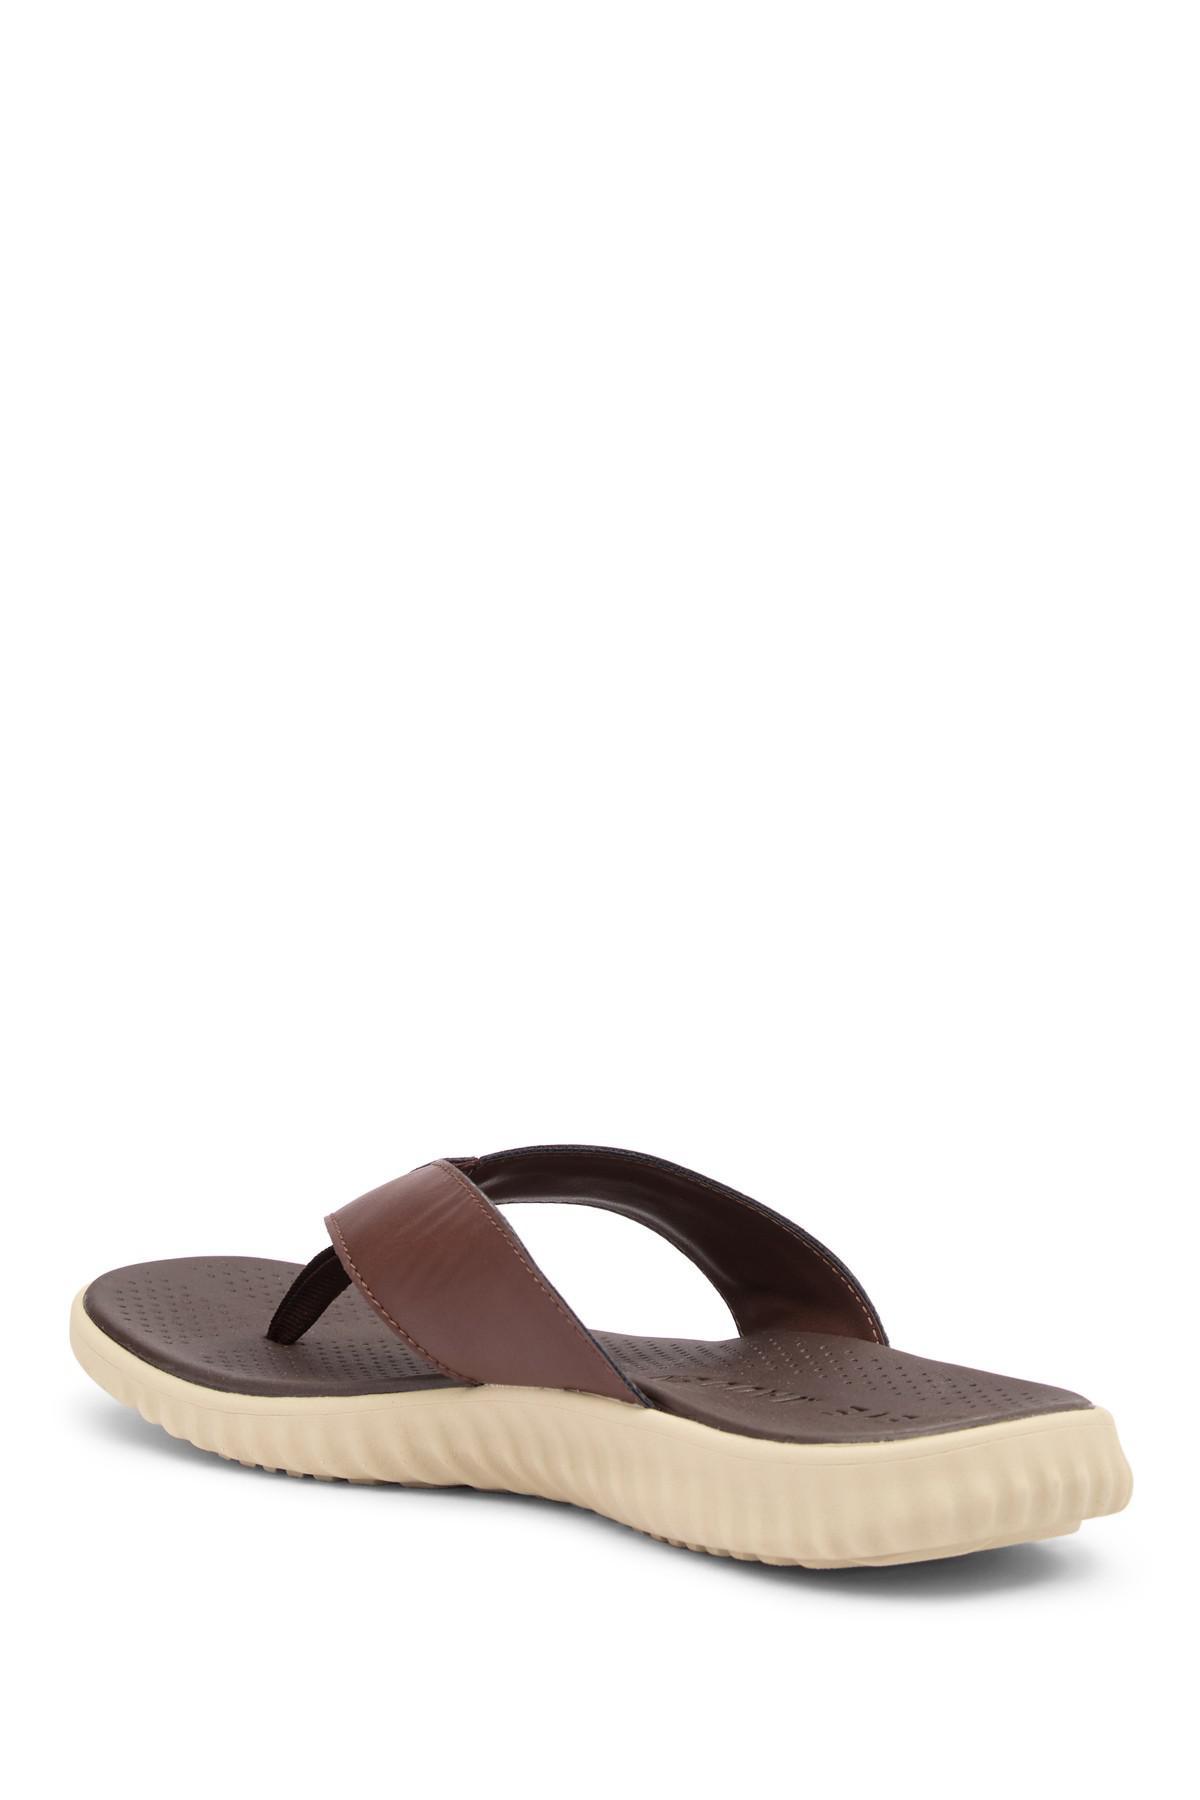 Steve Madden Santee Thong Sandal 0x4RwAt8